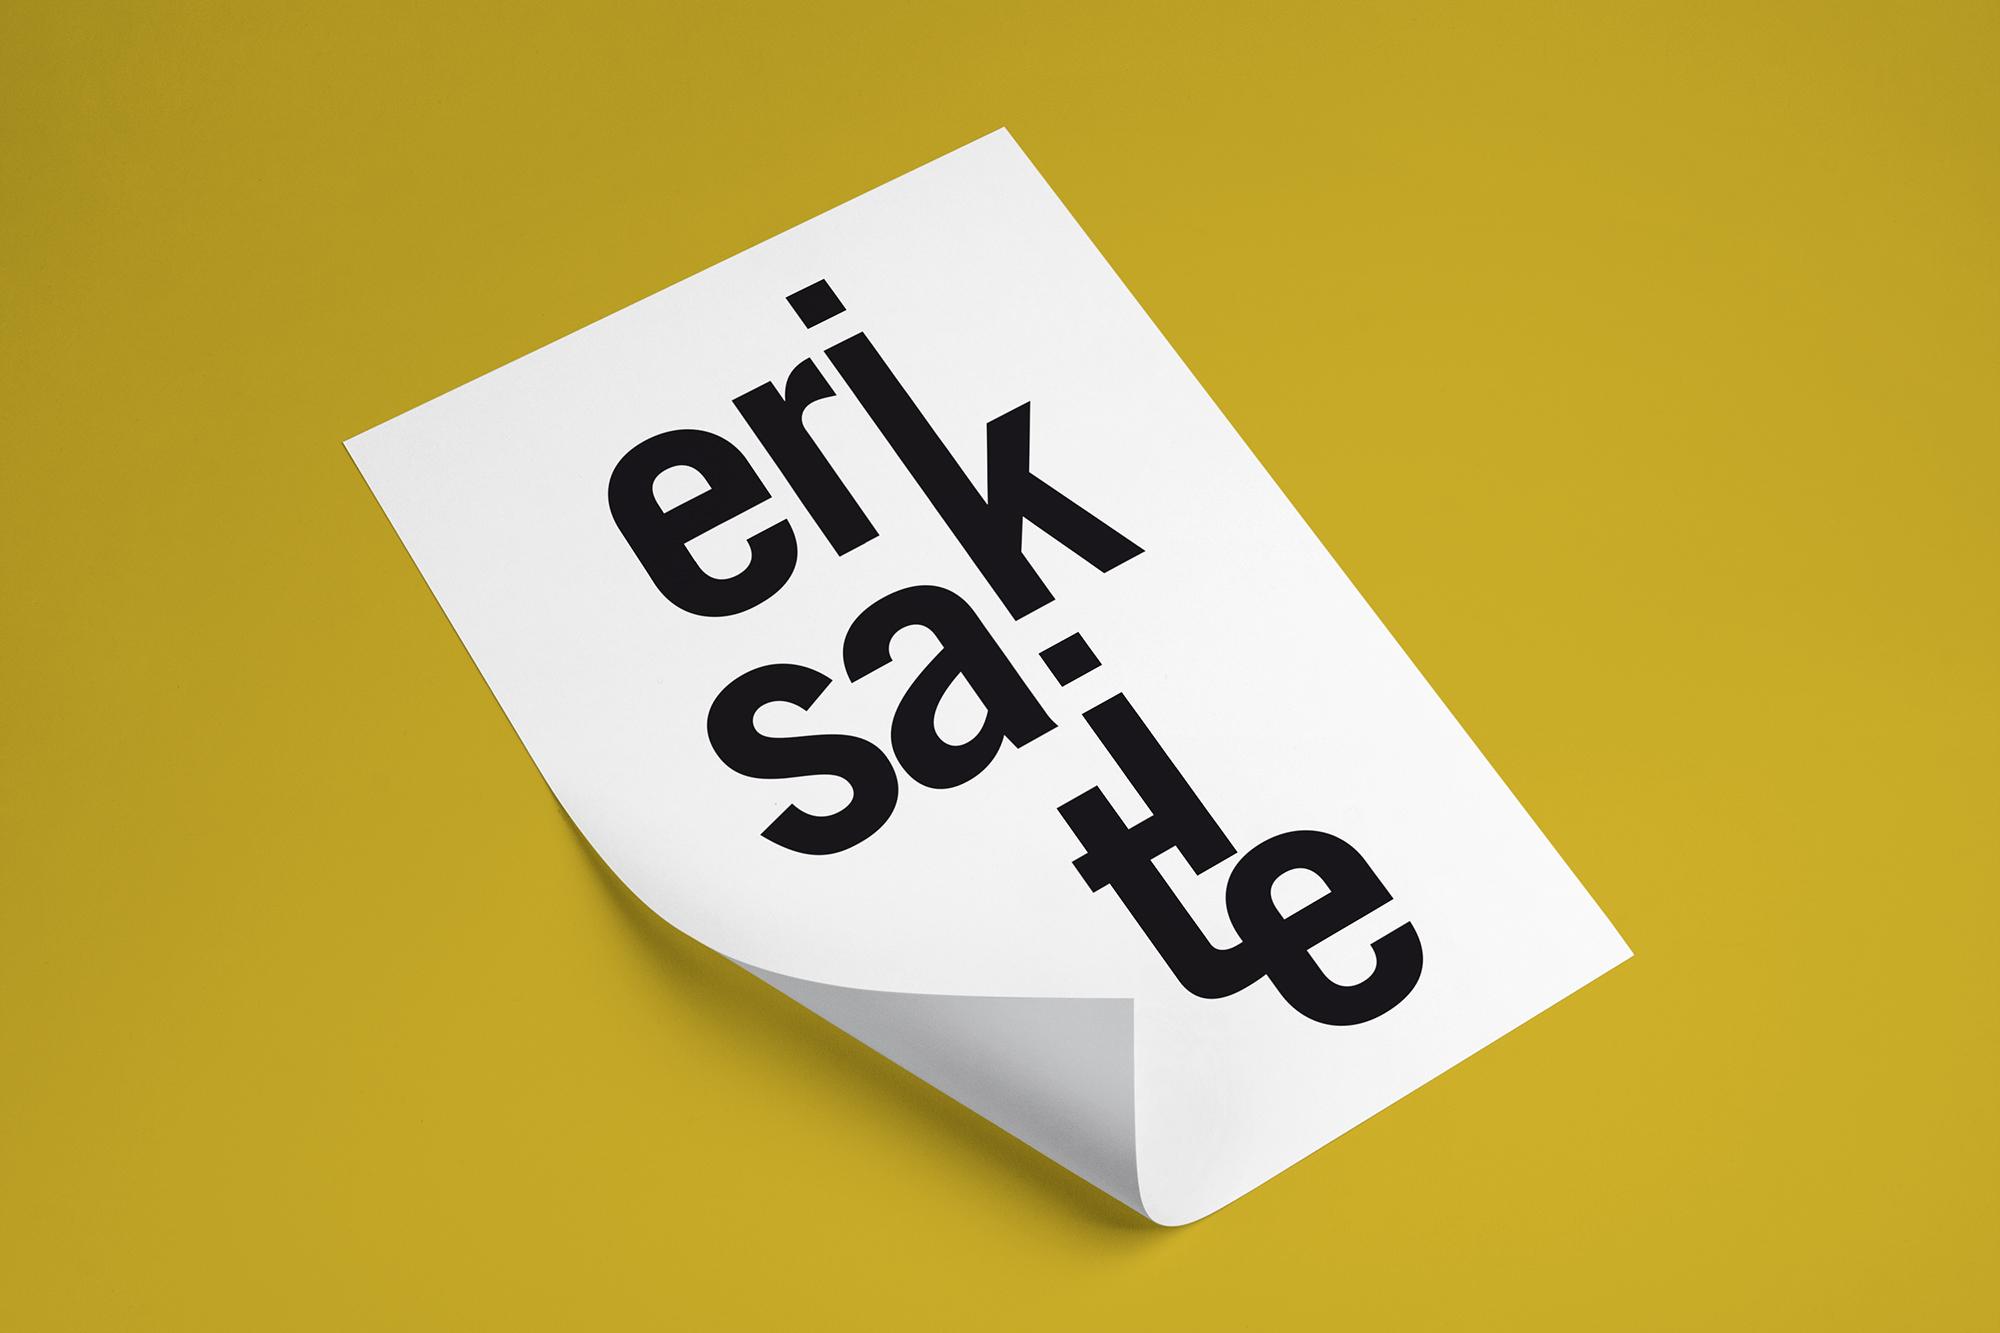 affiche typographique Erik Satie